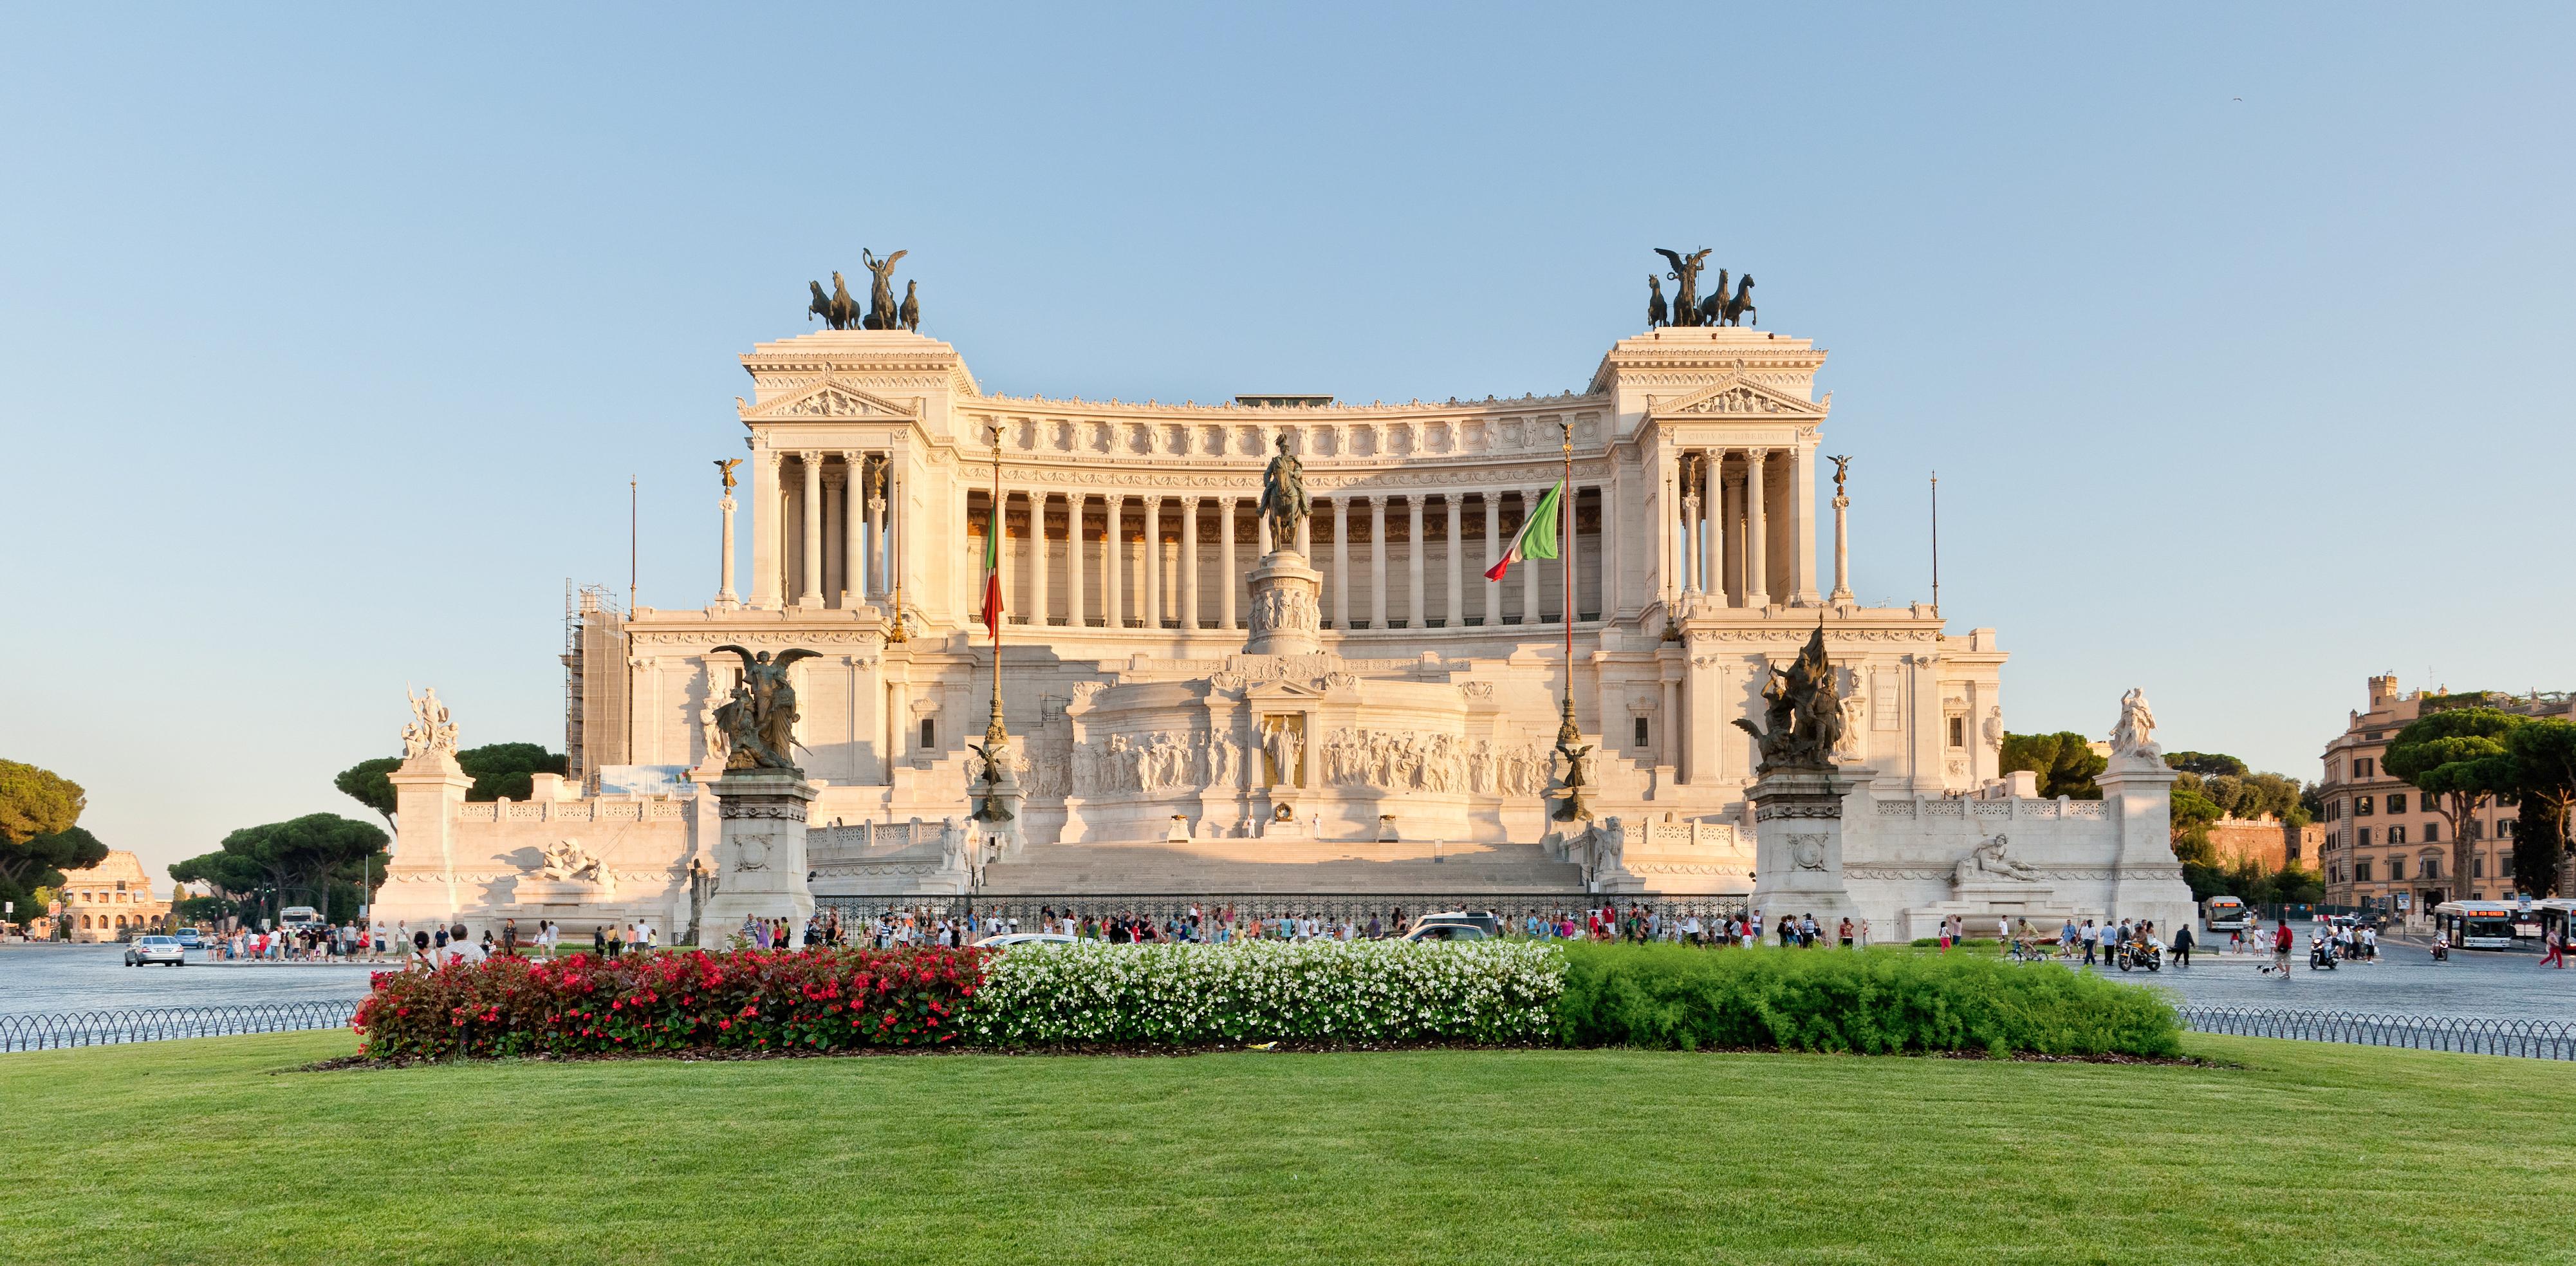 Casa Coppola Roma Rm victor emmanuel ii monument - wikipedia